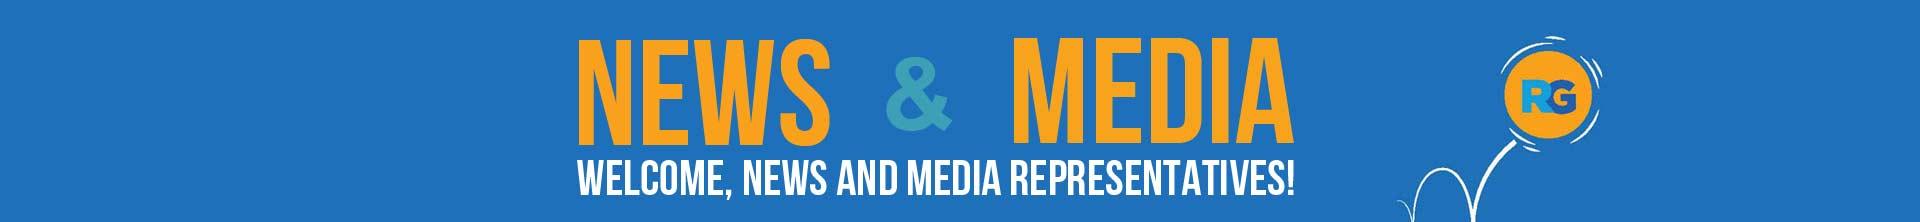 News and Media representatives